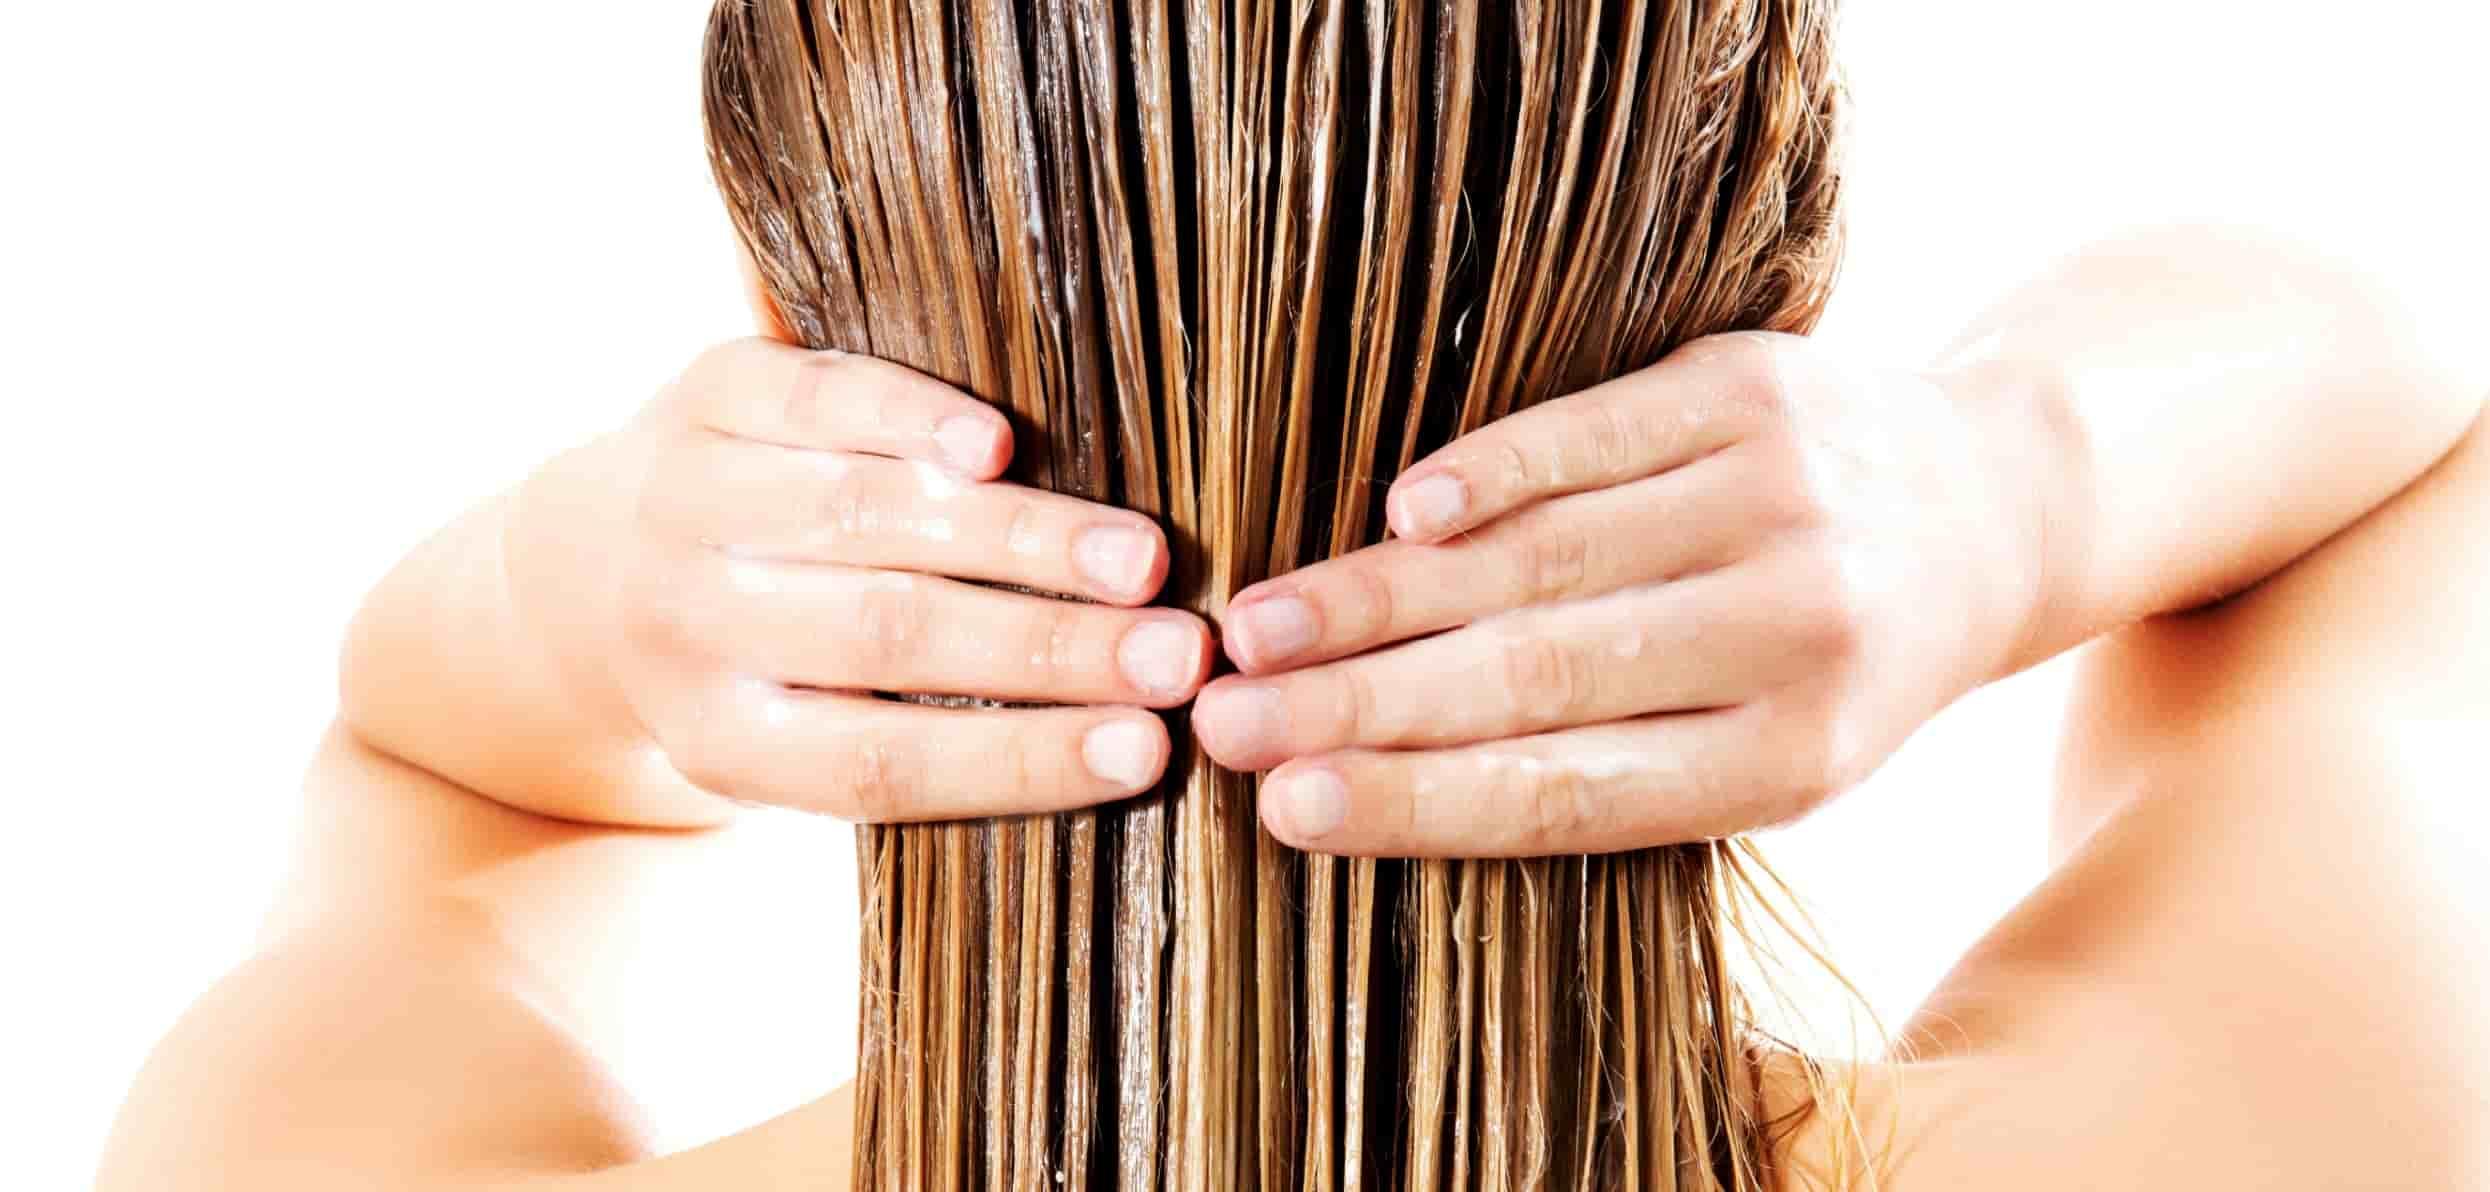 Woman applying the treatment on her hair - hair loss and thyroid